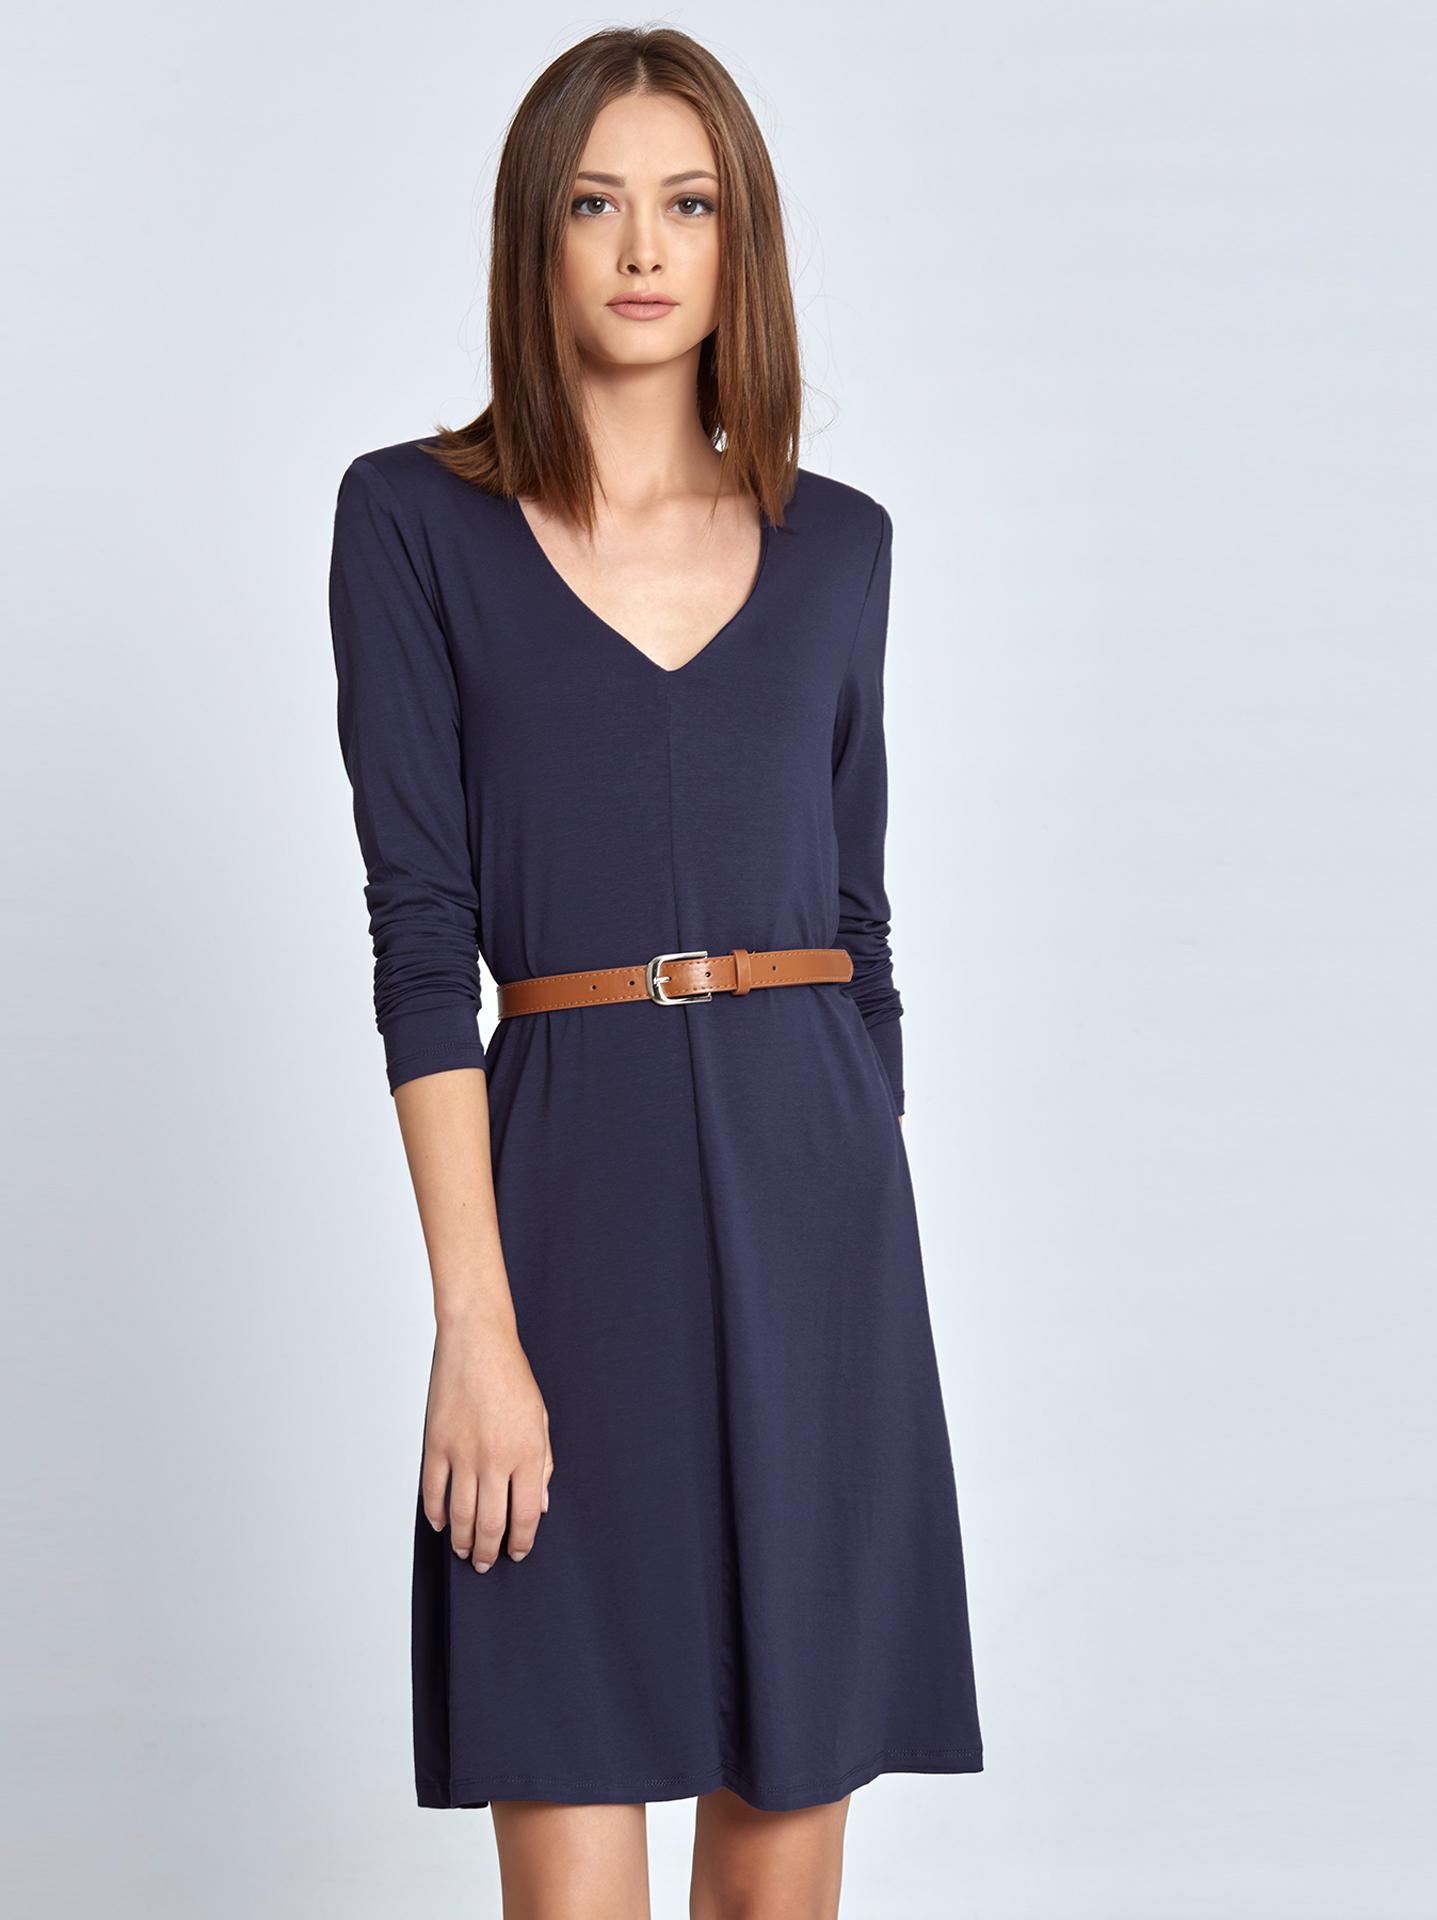 5cb2a22afb61 Midi φόρεμα με βάτες σε μπλε ραφ